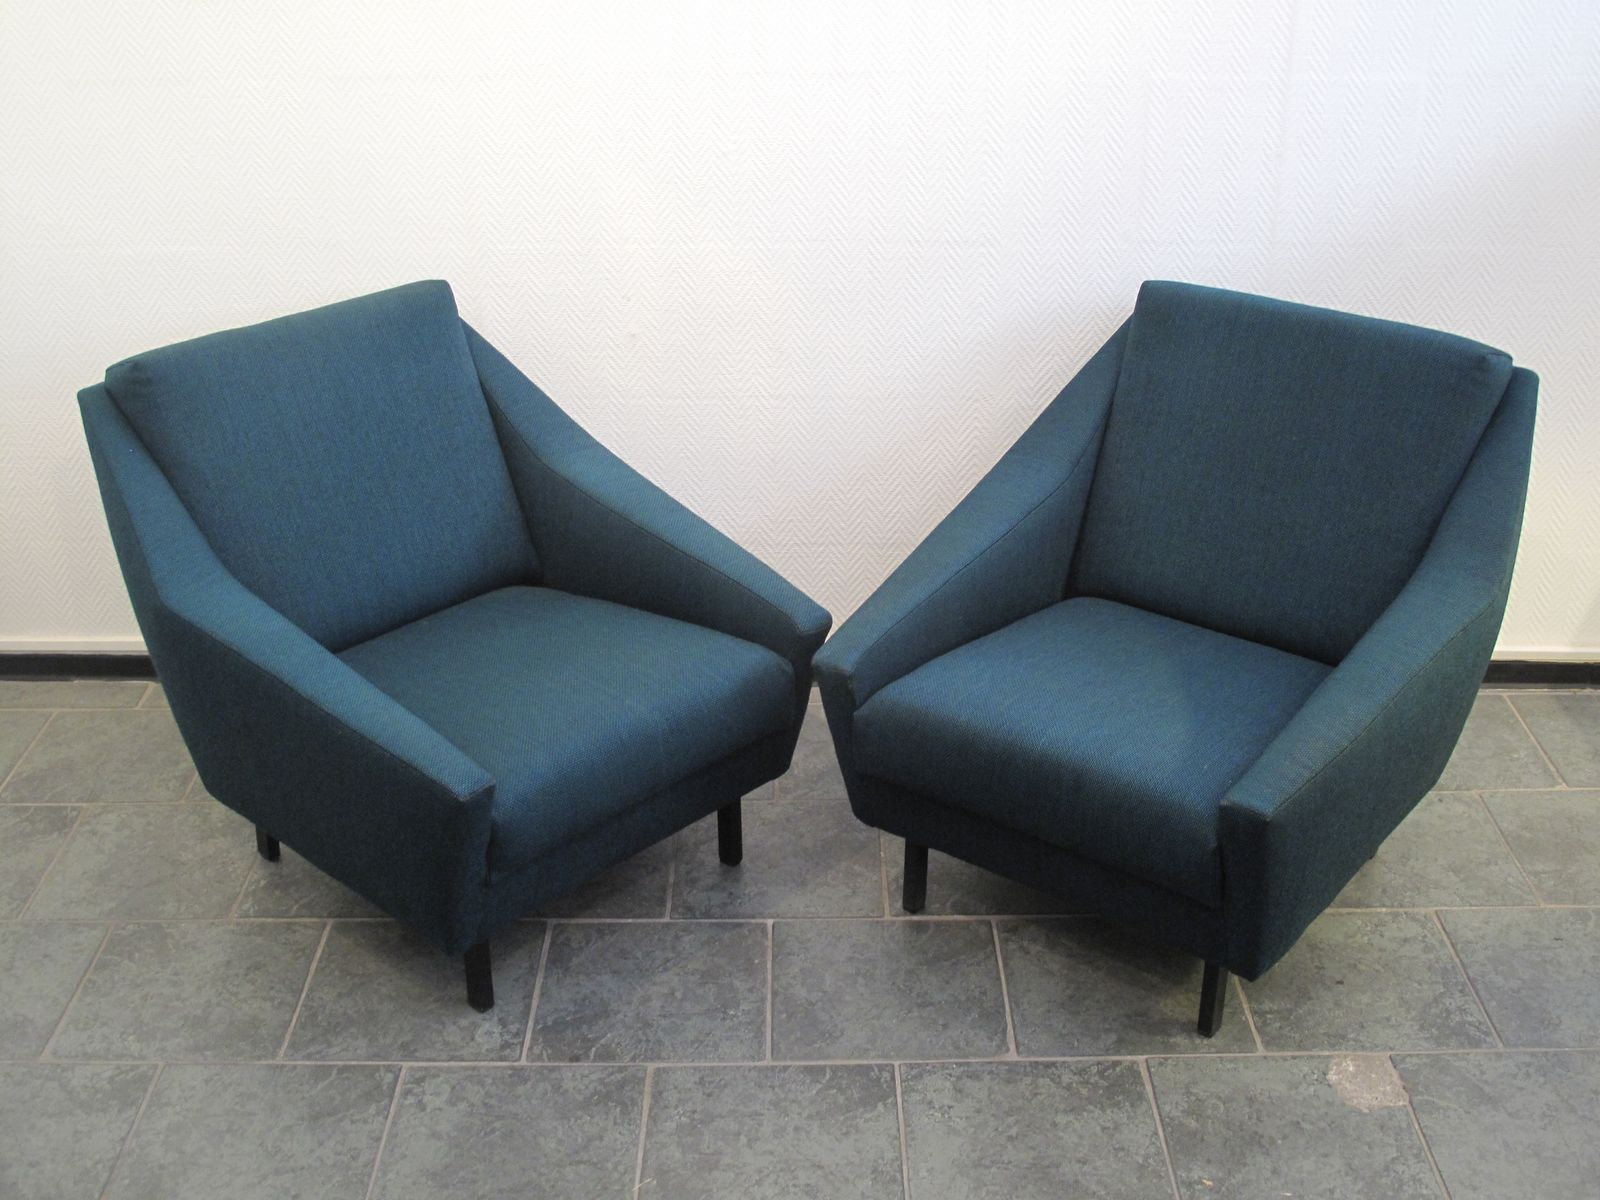 blaue italienische mid century sessel 1970er 2er set bei. Black Bedroom Furniture Sets. Home Design Ideas